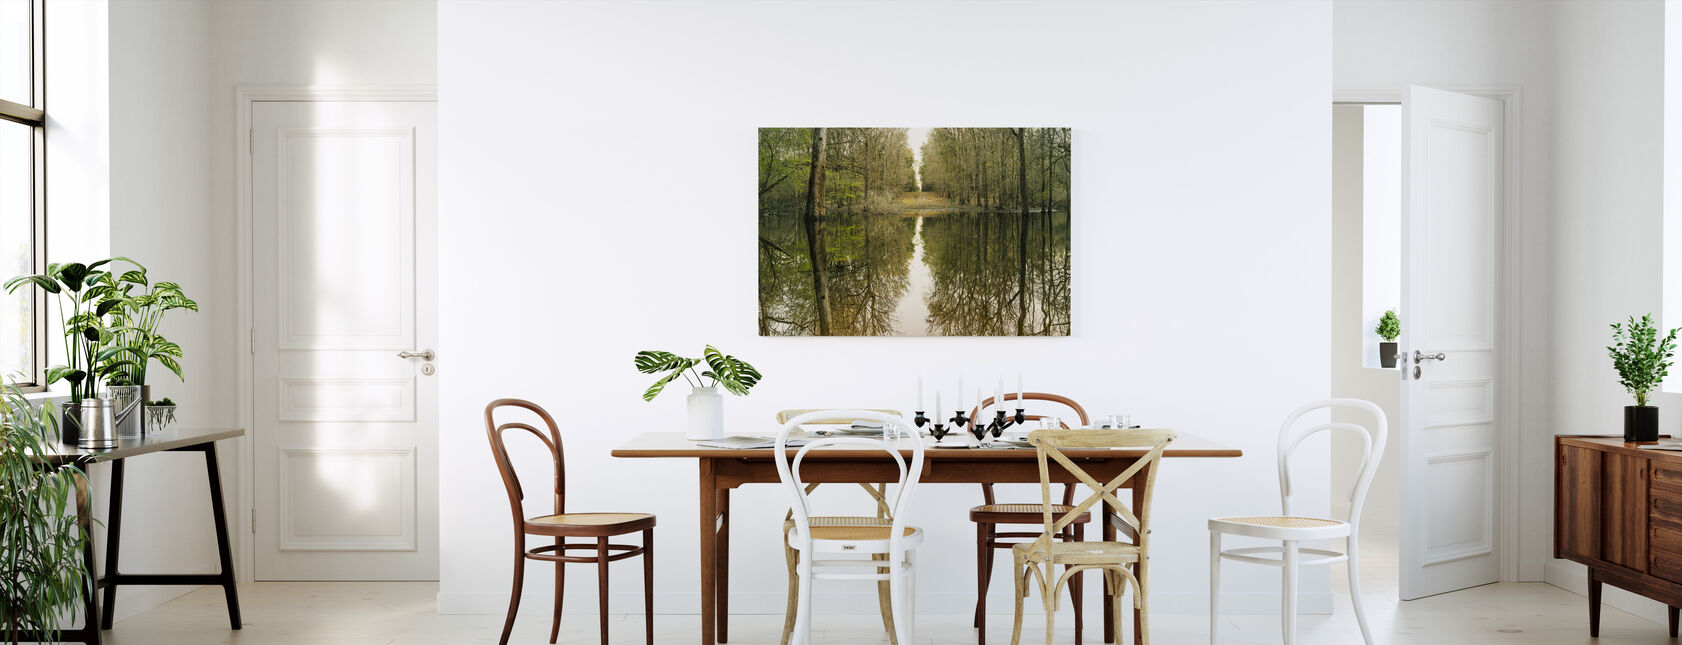 Suwanne Reflektion Panorama - Canvastavla - Kök